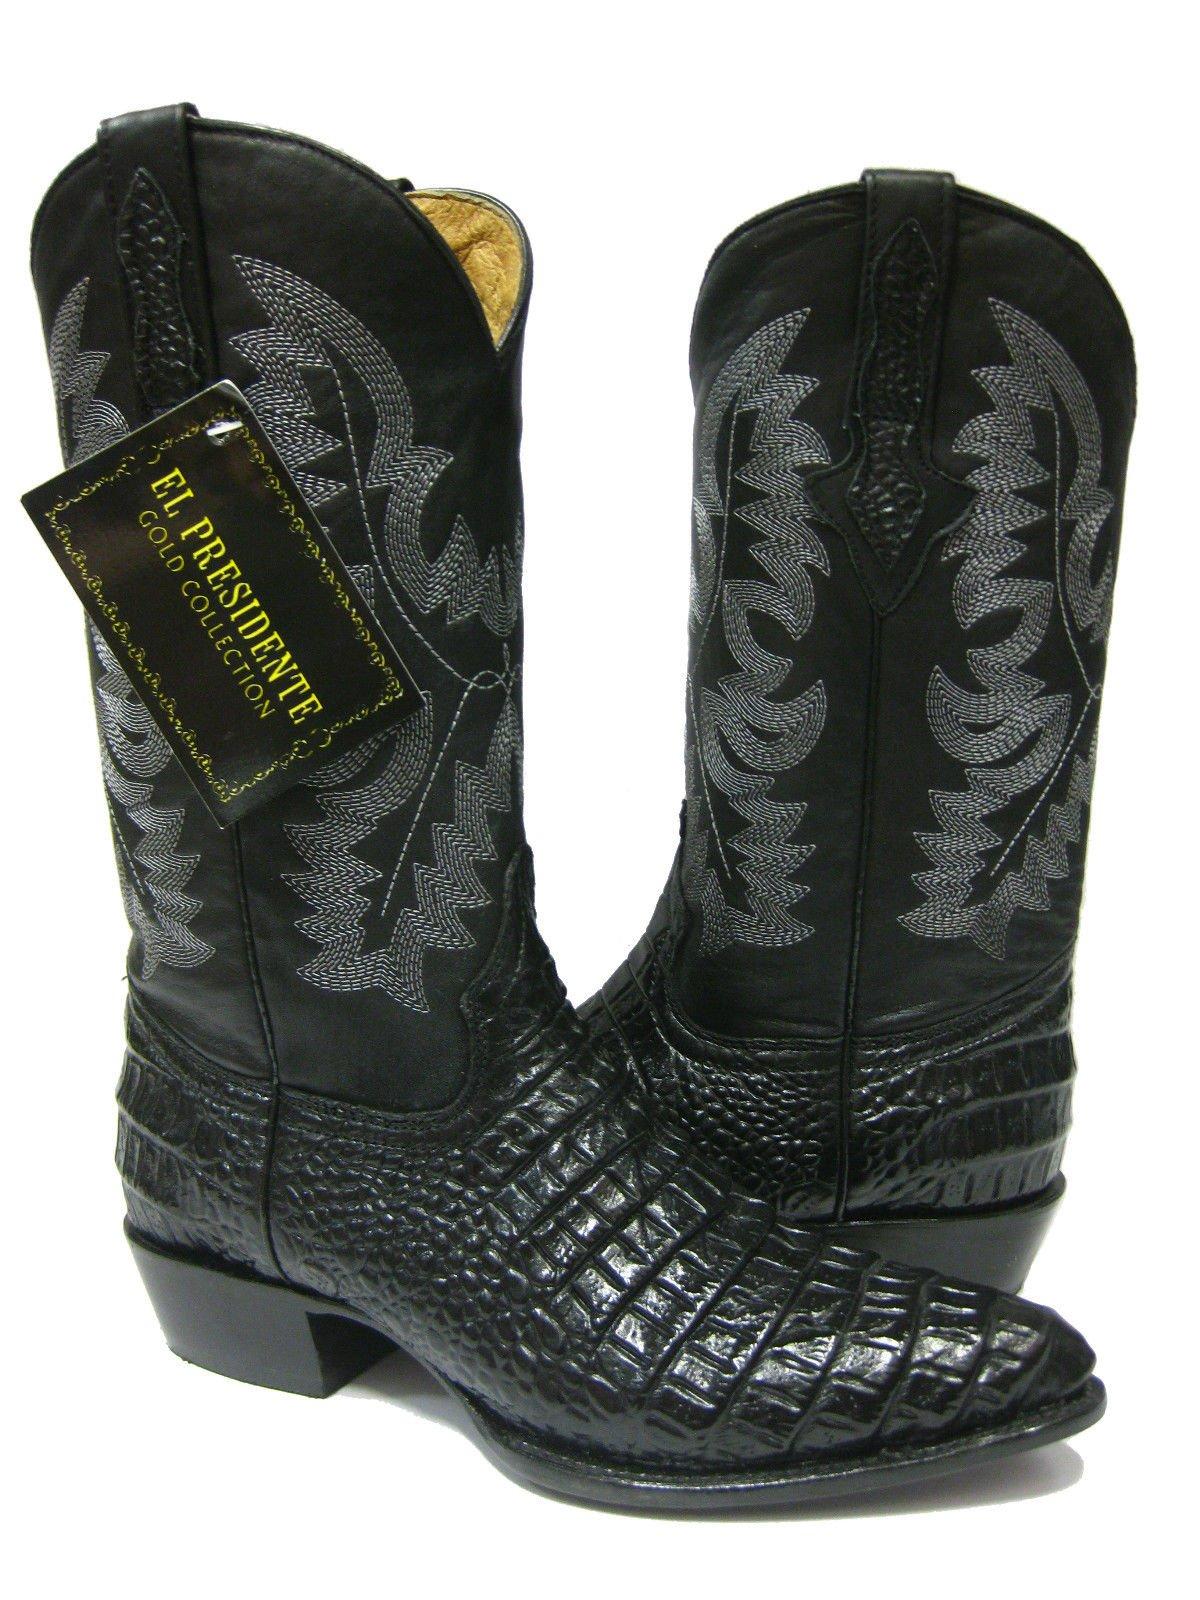 El Presidente Men's Black Crocodile Belly Design Leather Cowboy Boots J Toe 13.5 EE